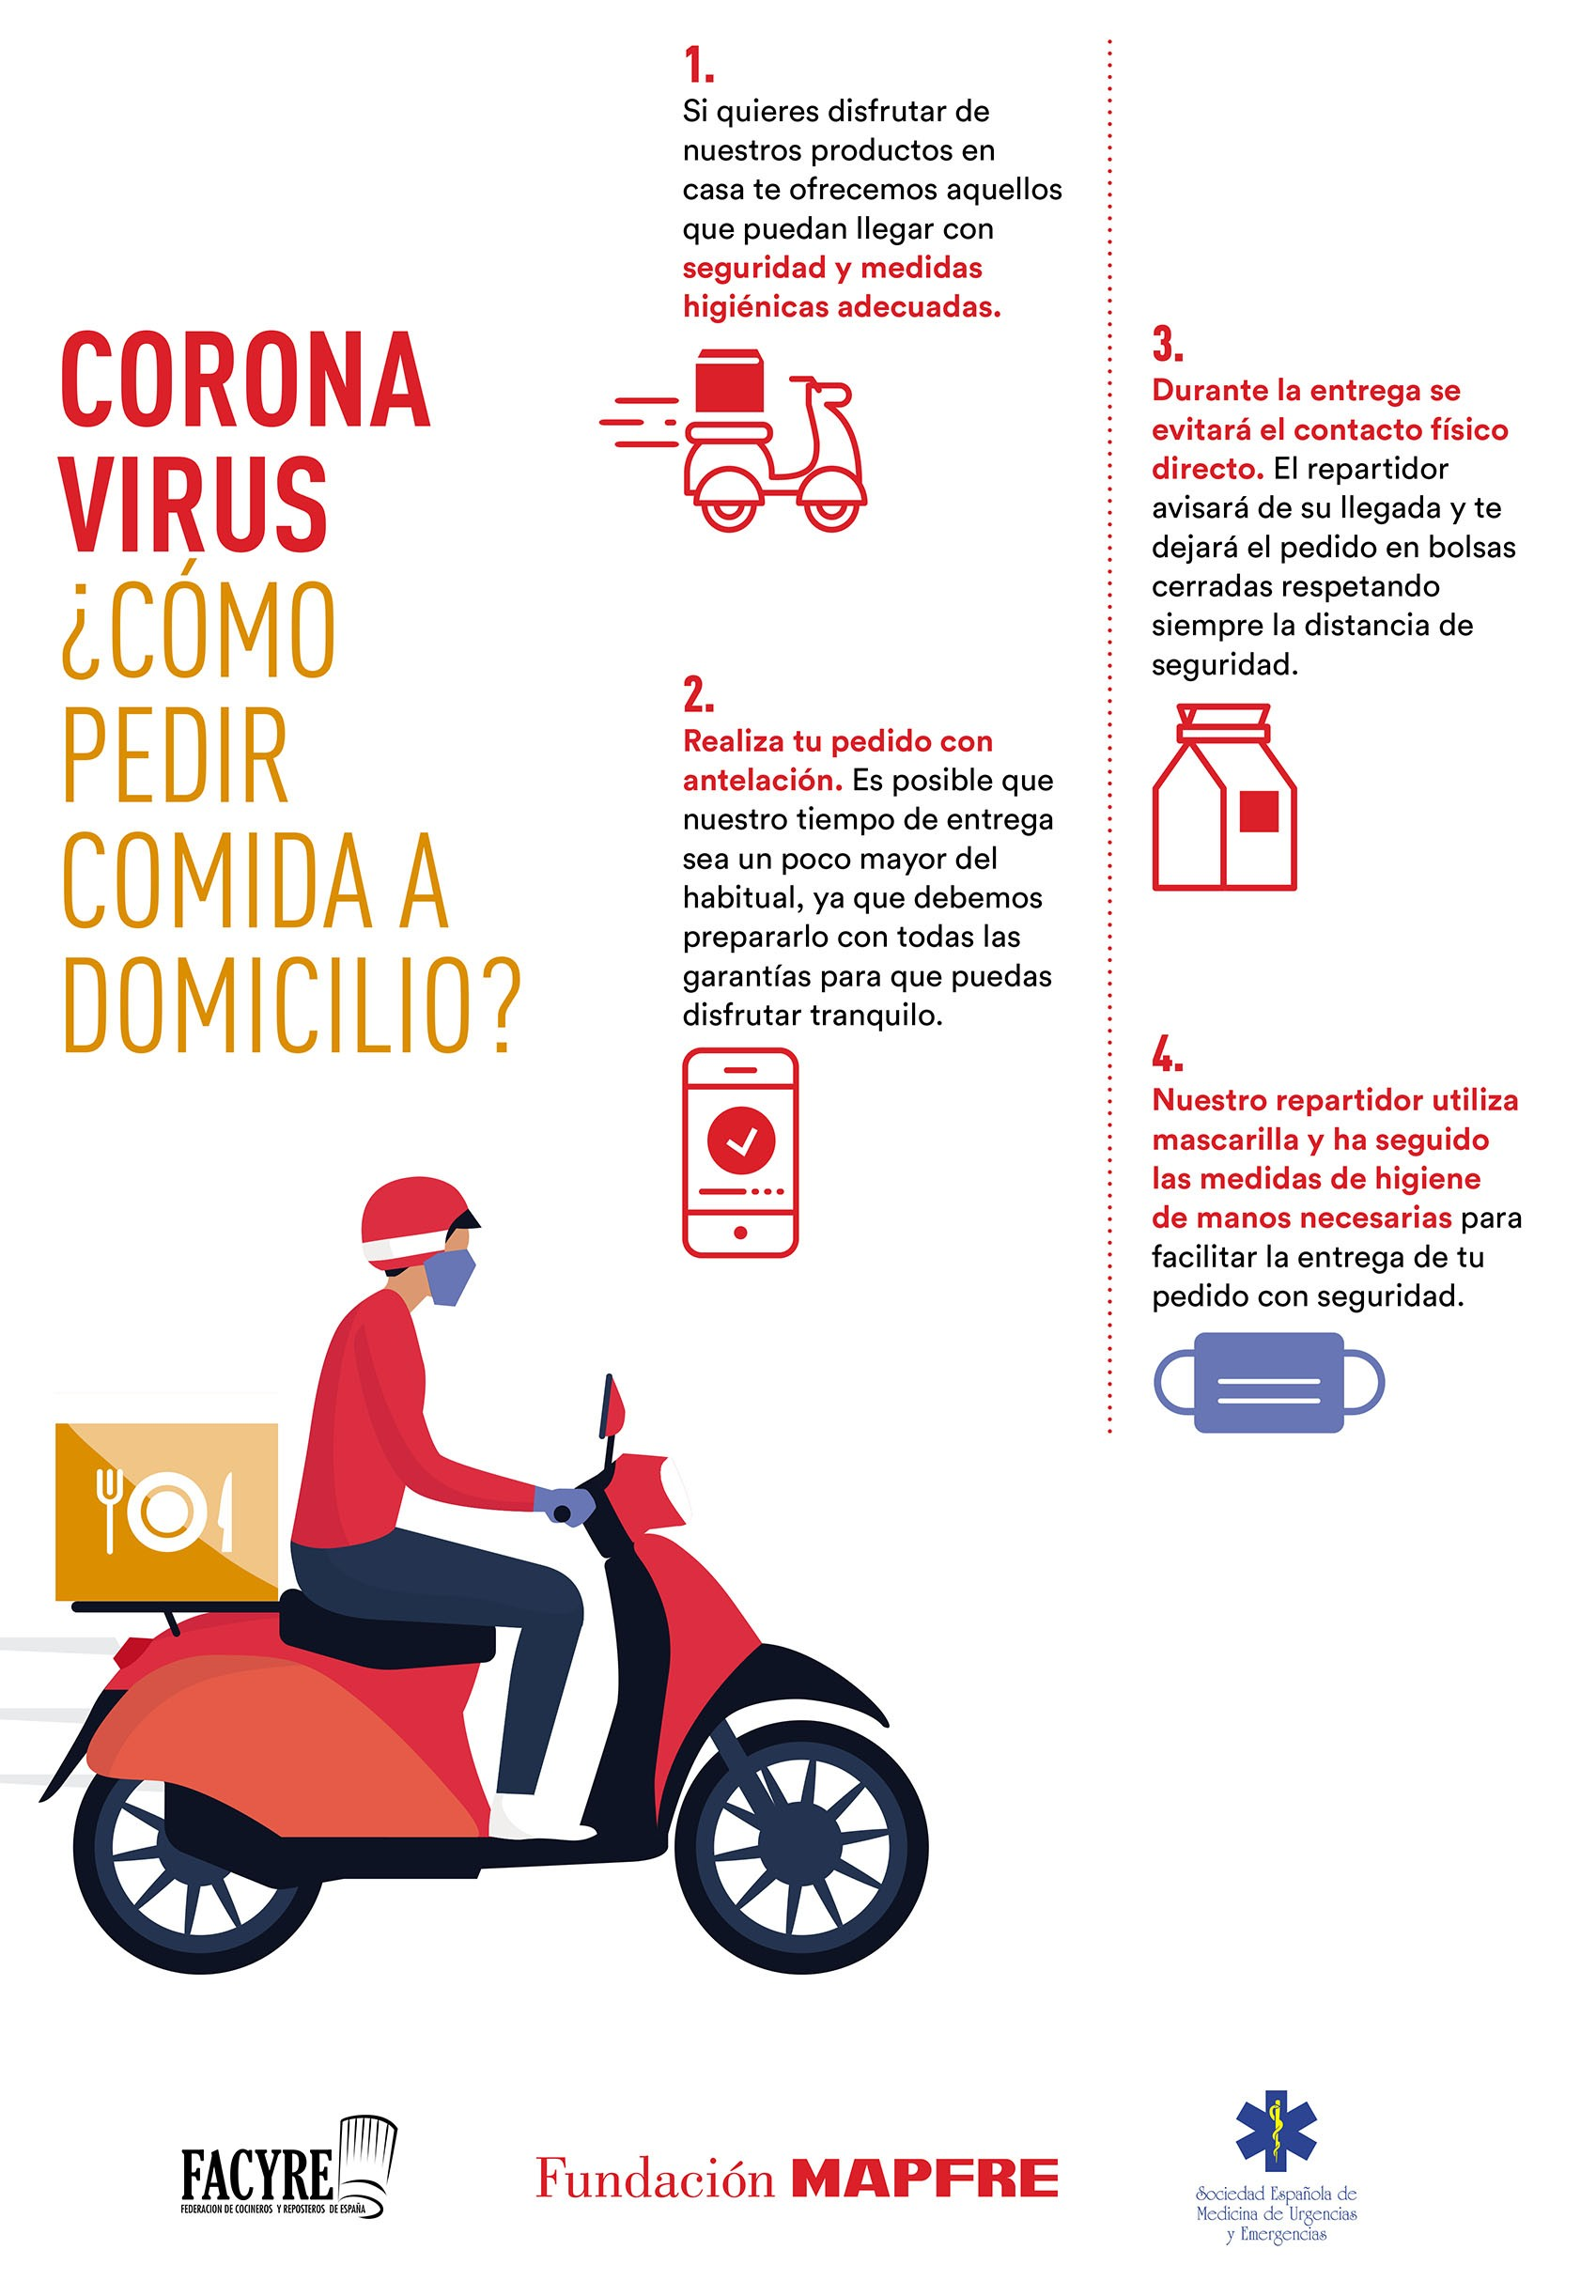 Coronavirus ¿Cómo pedir comida a domicilio? MAPFRE